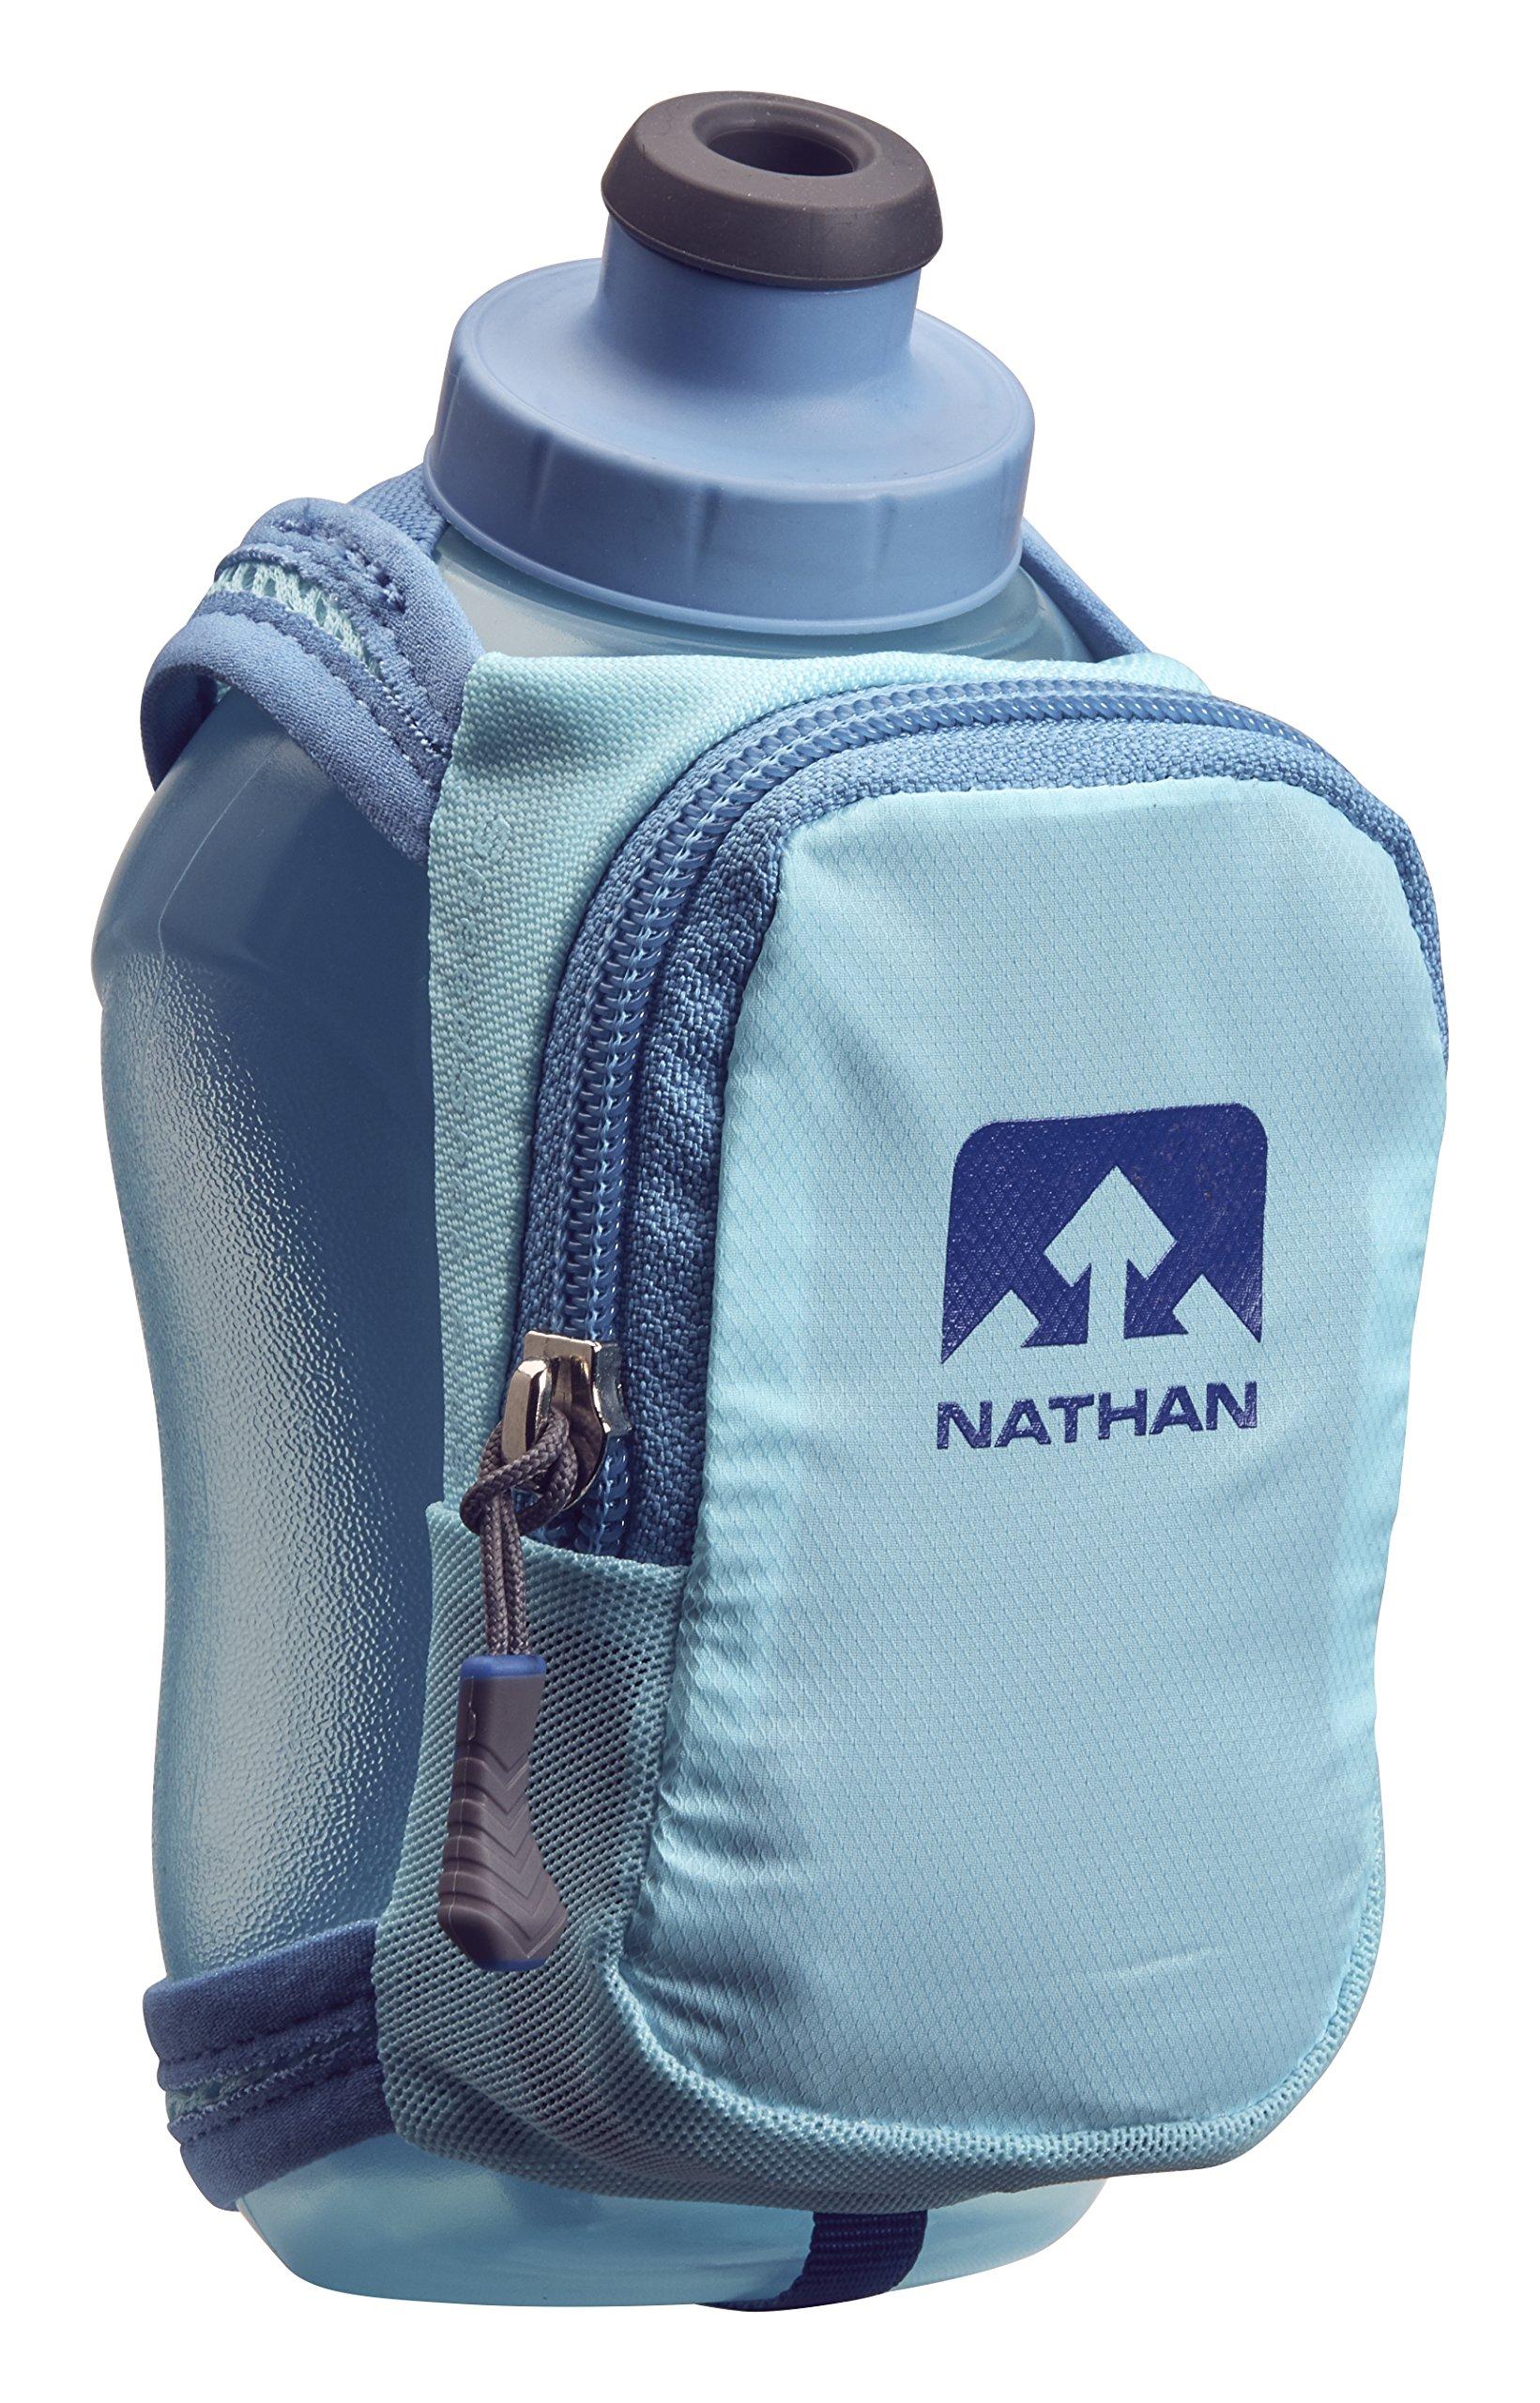 Nathan NS4859 Speedshot Plus Quick Grip 12 oz Running Water Bottle Flask with Zip Pocket, Blue Radiance